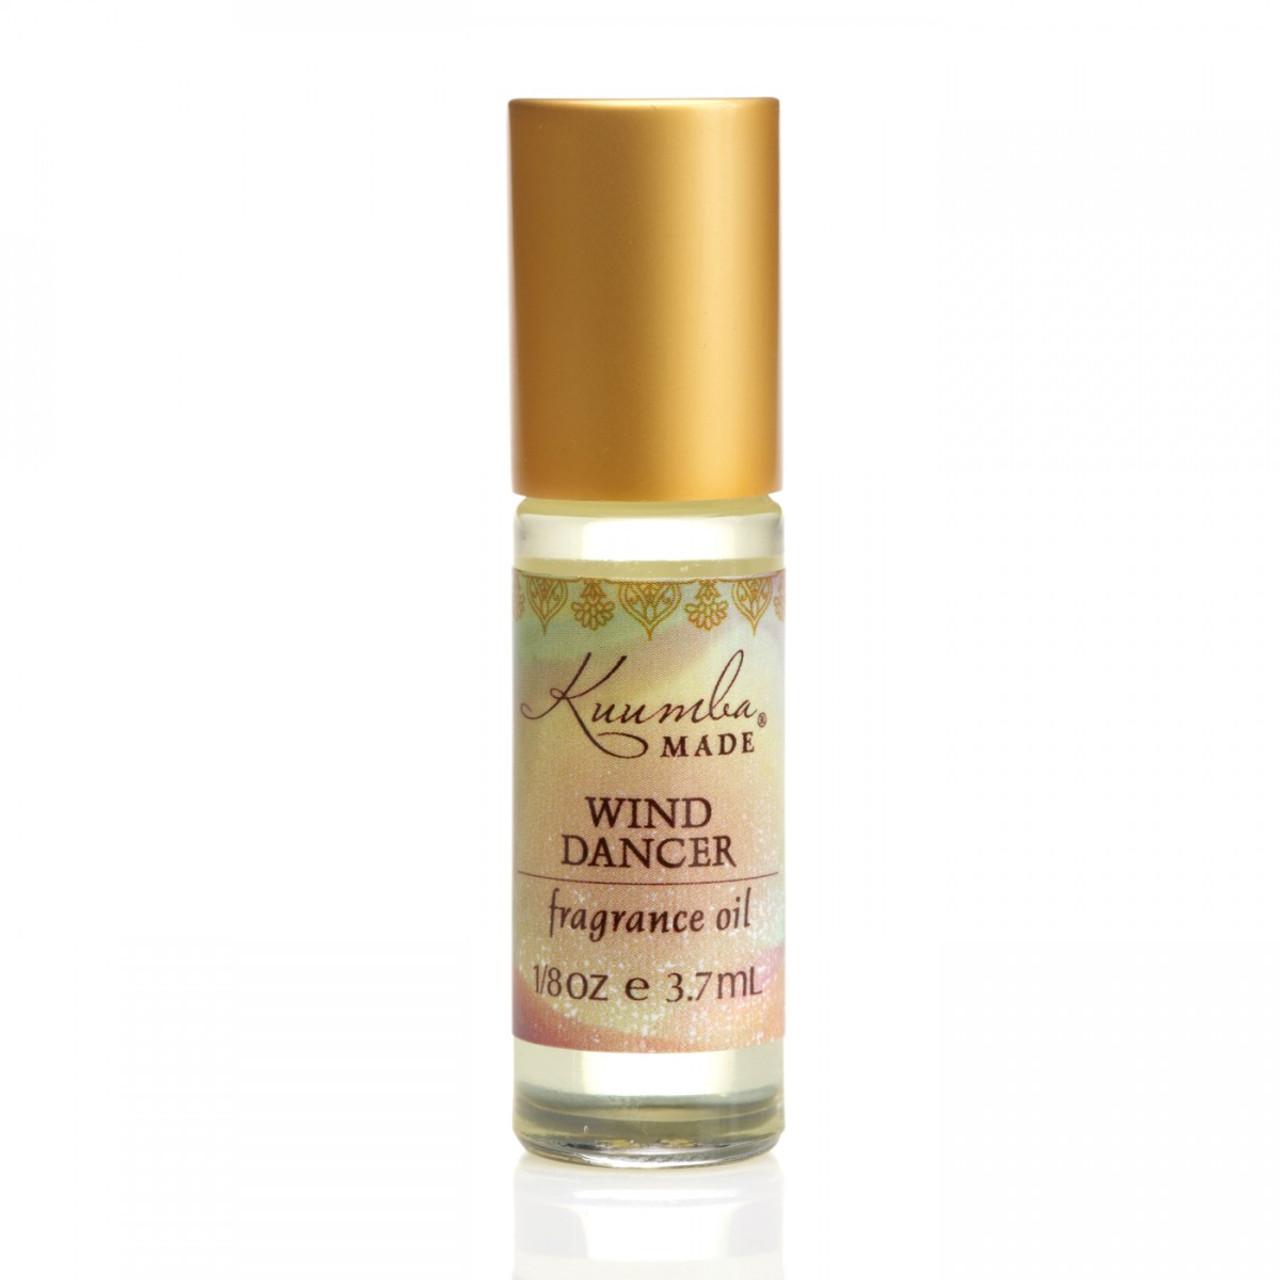 Kuumba Made Wind Dancer Fragrance Oil